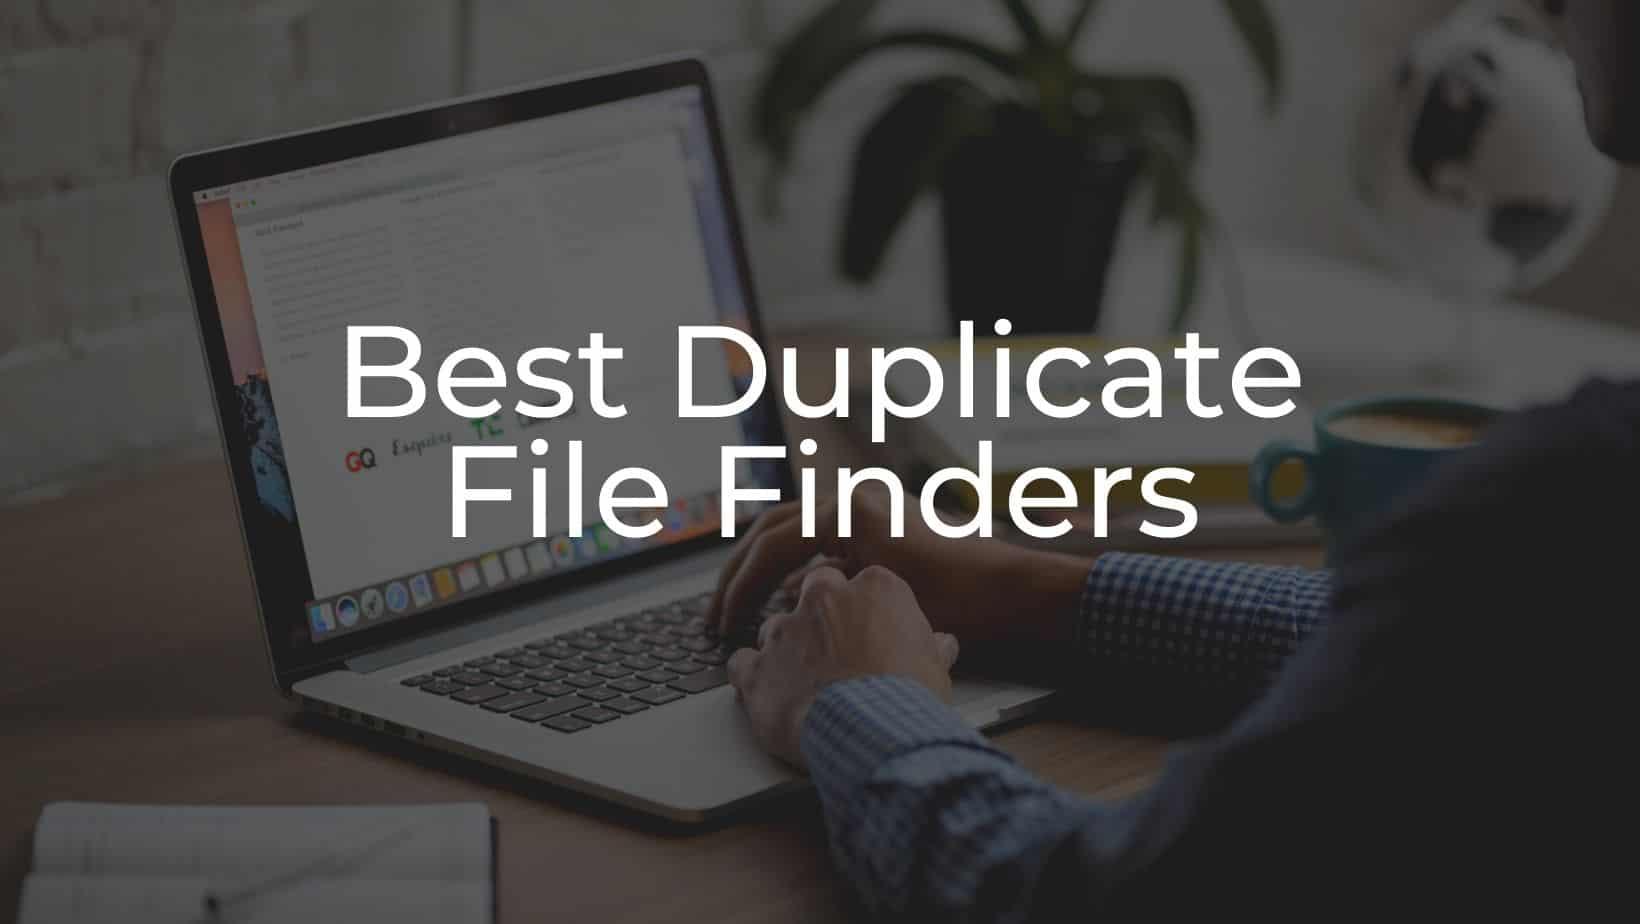 Best Duplicate File Finders